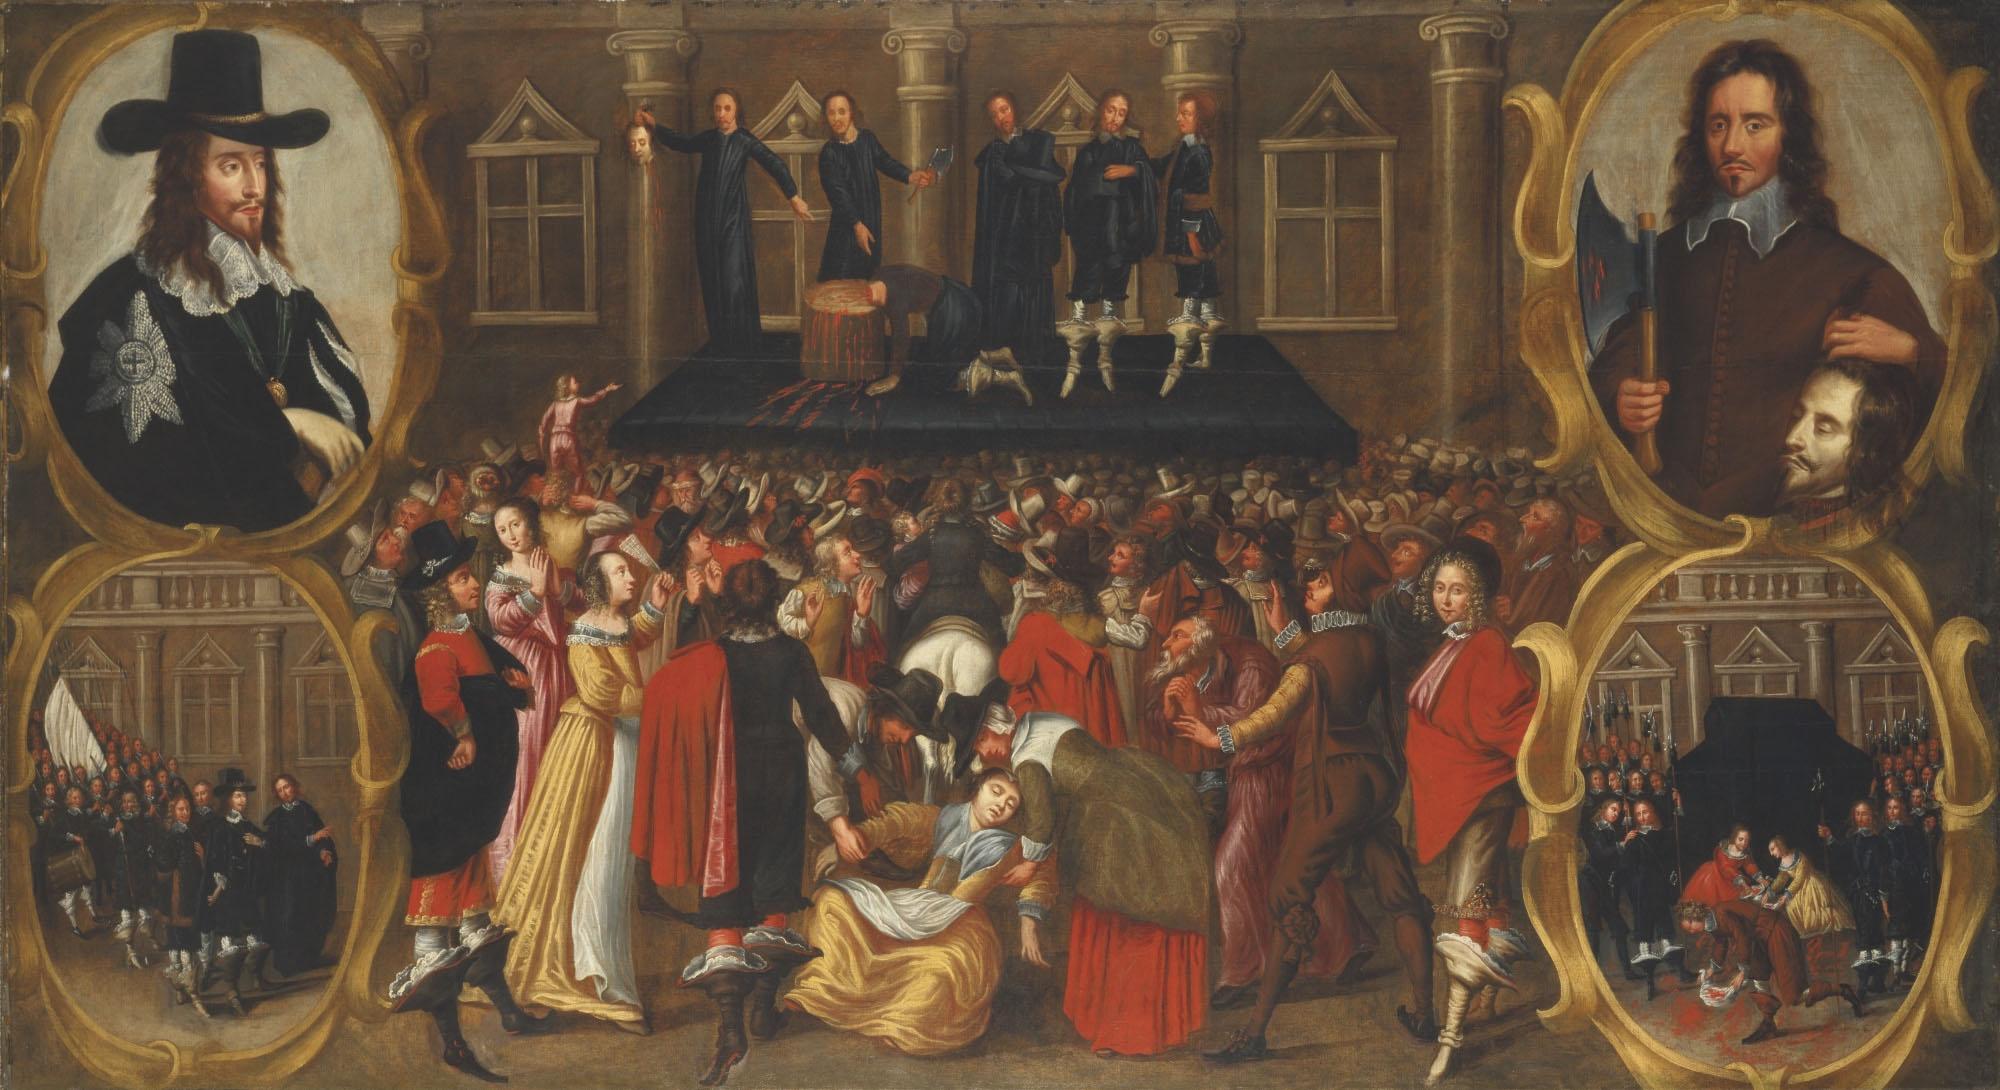 why parliament diskliked charles i essay